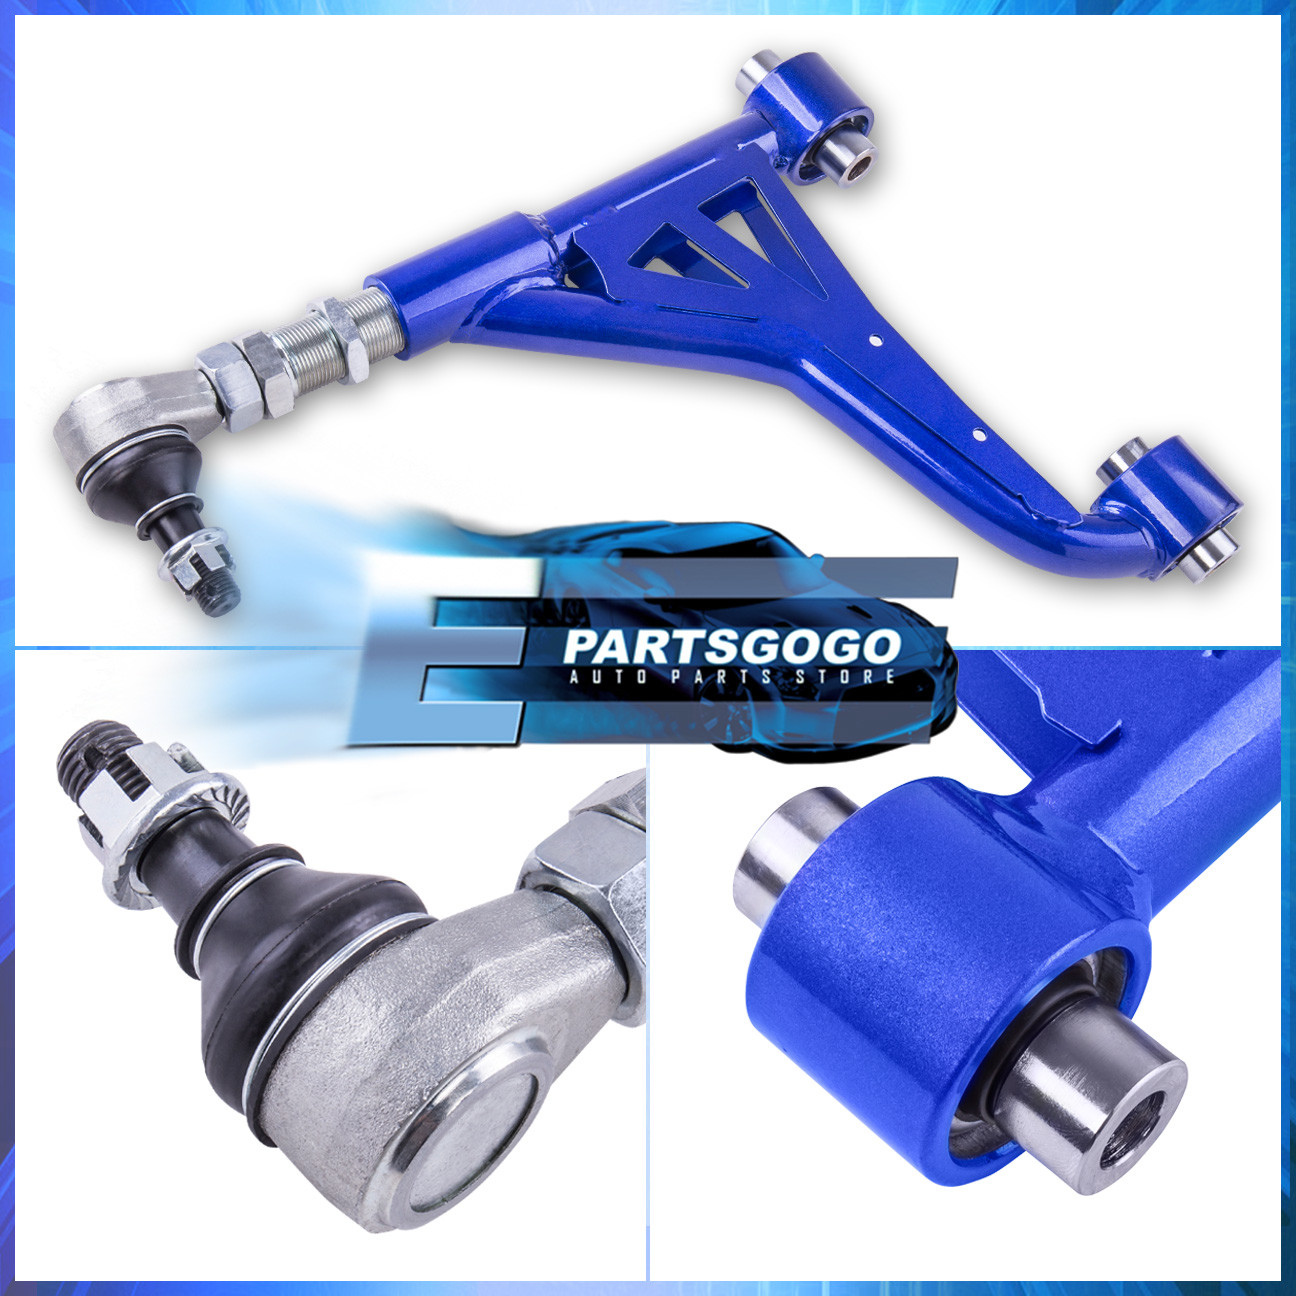 For 98-05 Gs300 Gs400 Gs430 01-05 Is300 Rear Upper Pillowball Camber Kit Blue